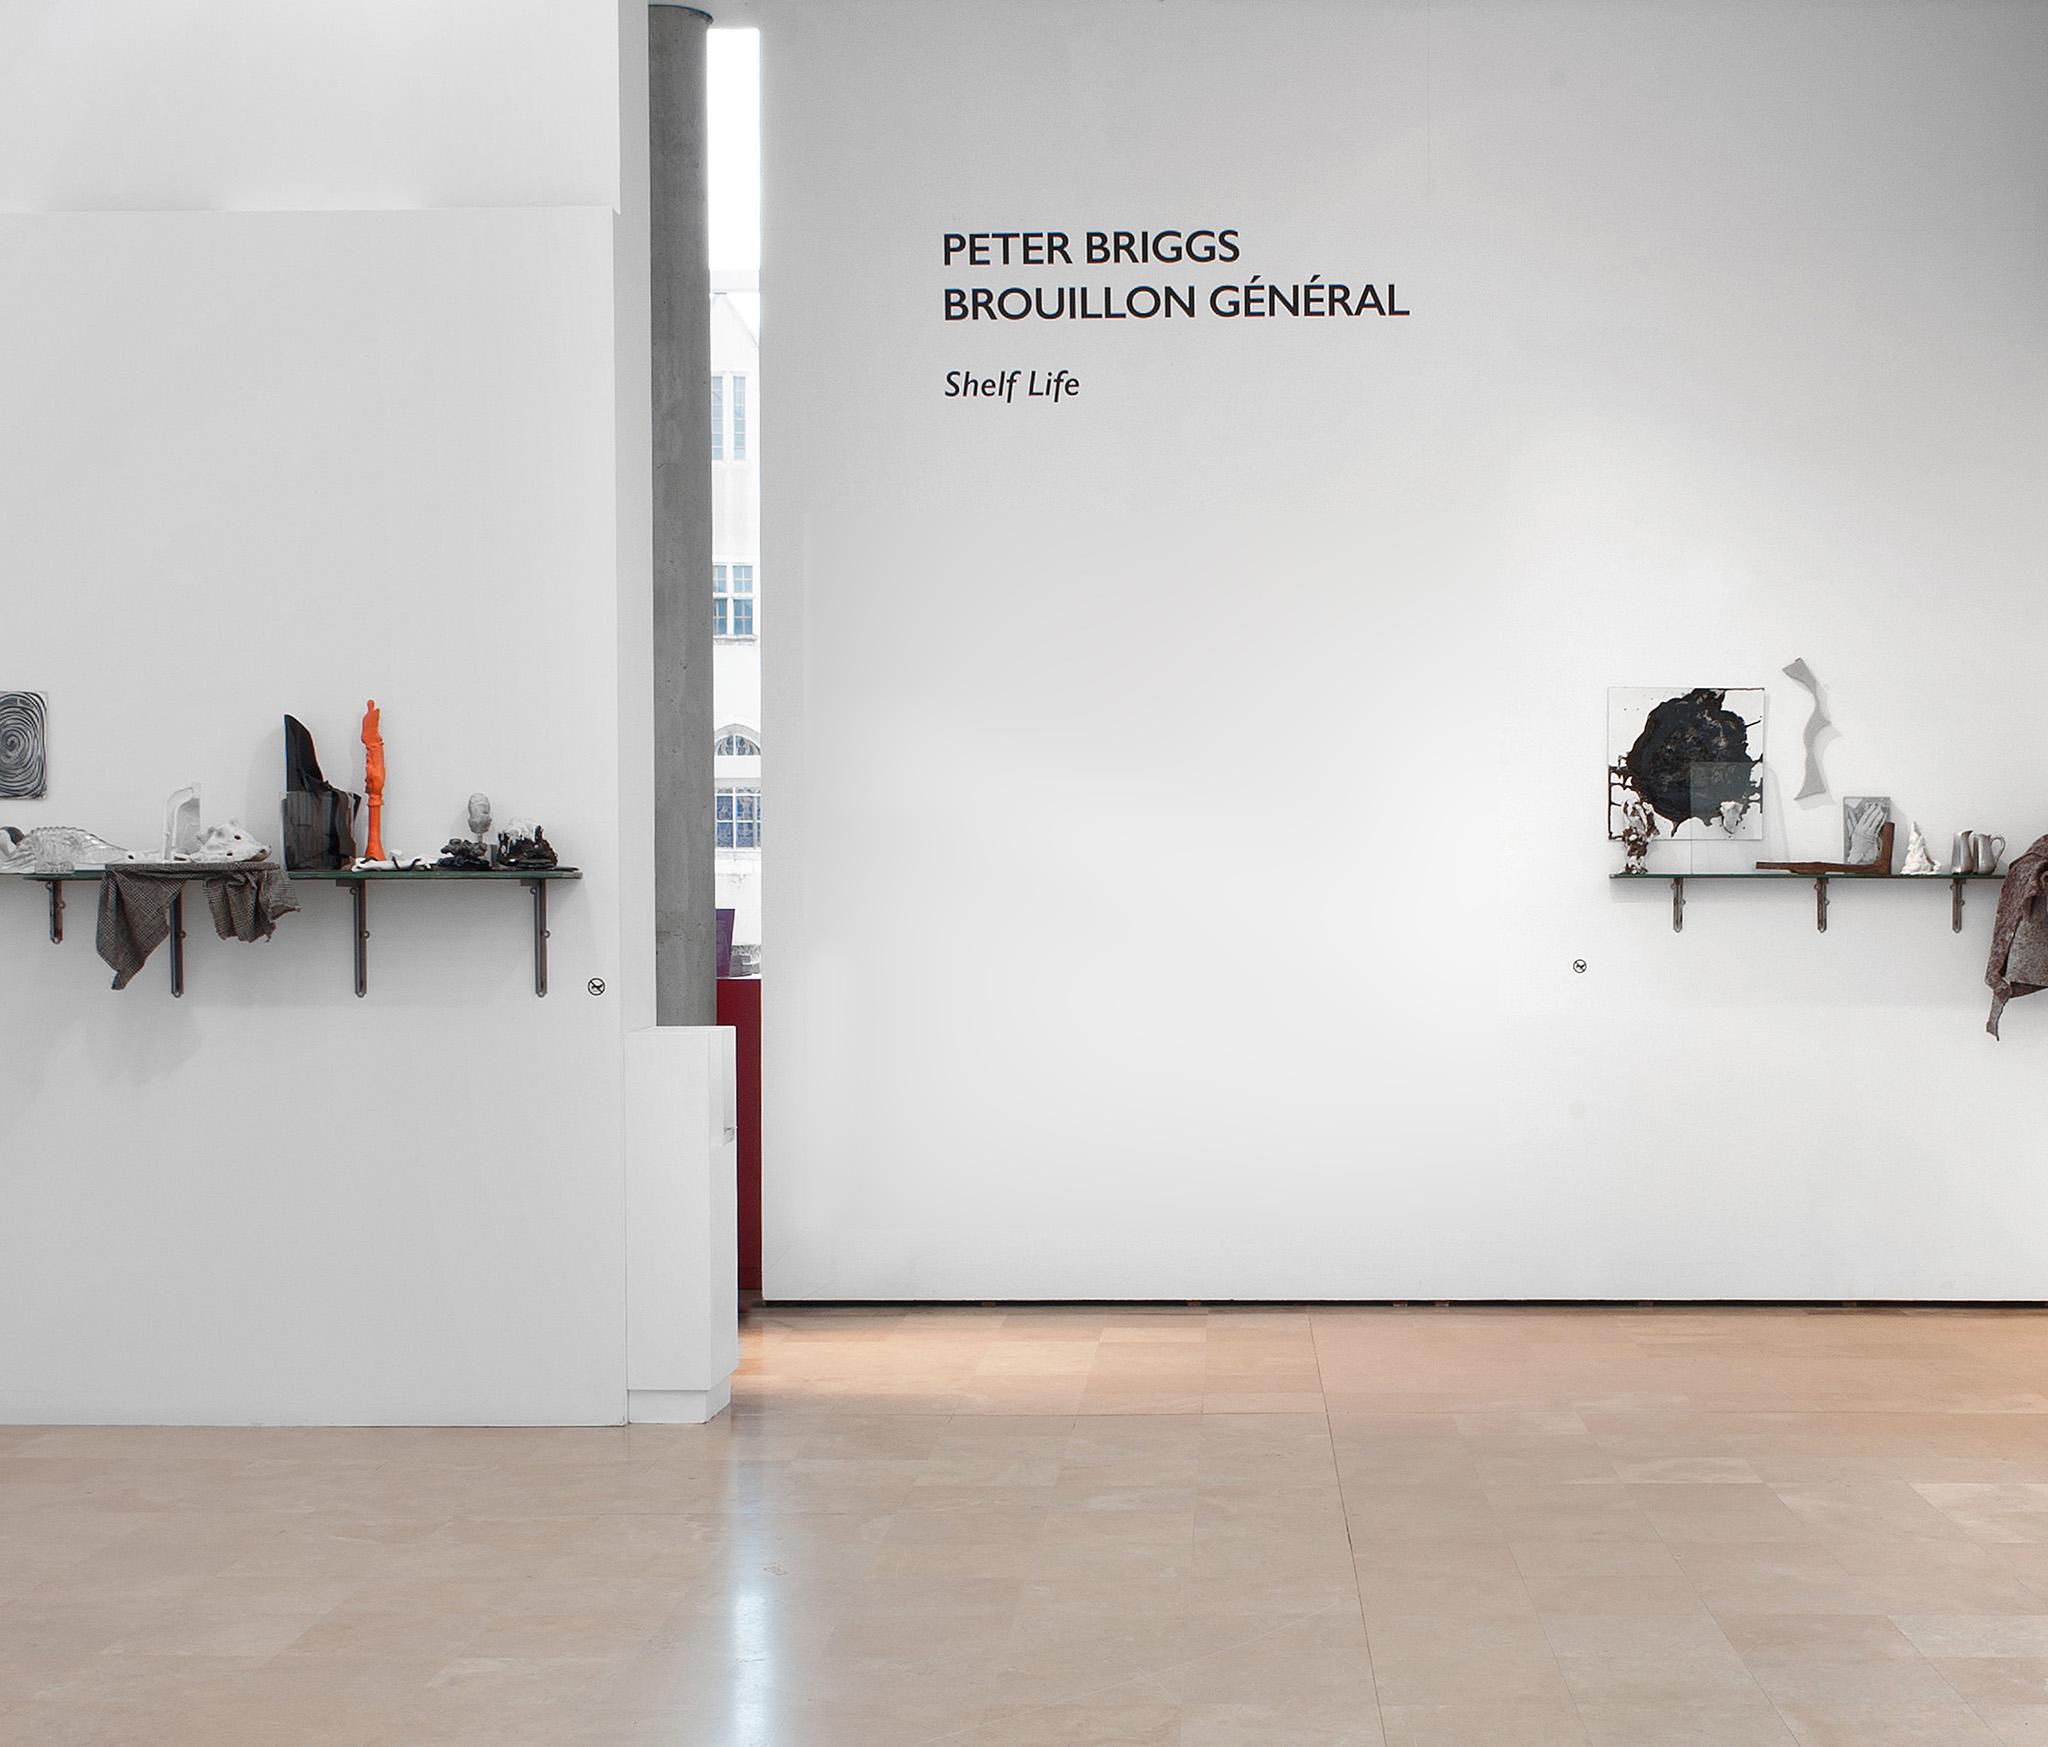 Vue d'exposition Peter Briggs au Musée Saint-Roch d'Issoudun (photo Alberto Ricci)